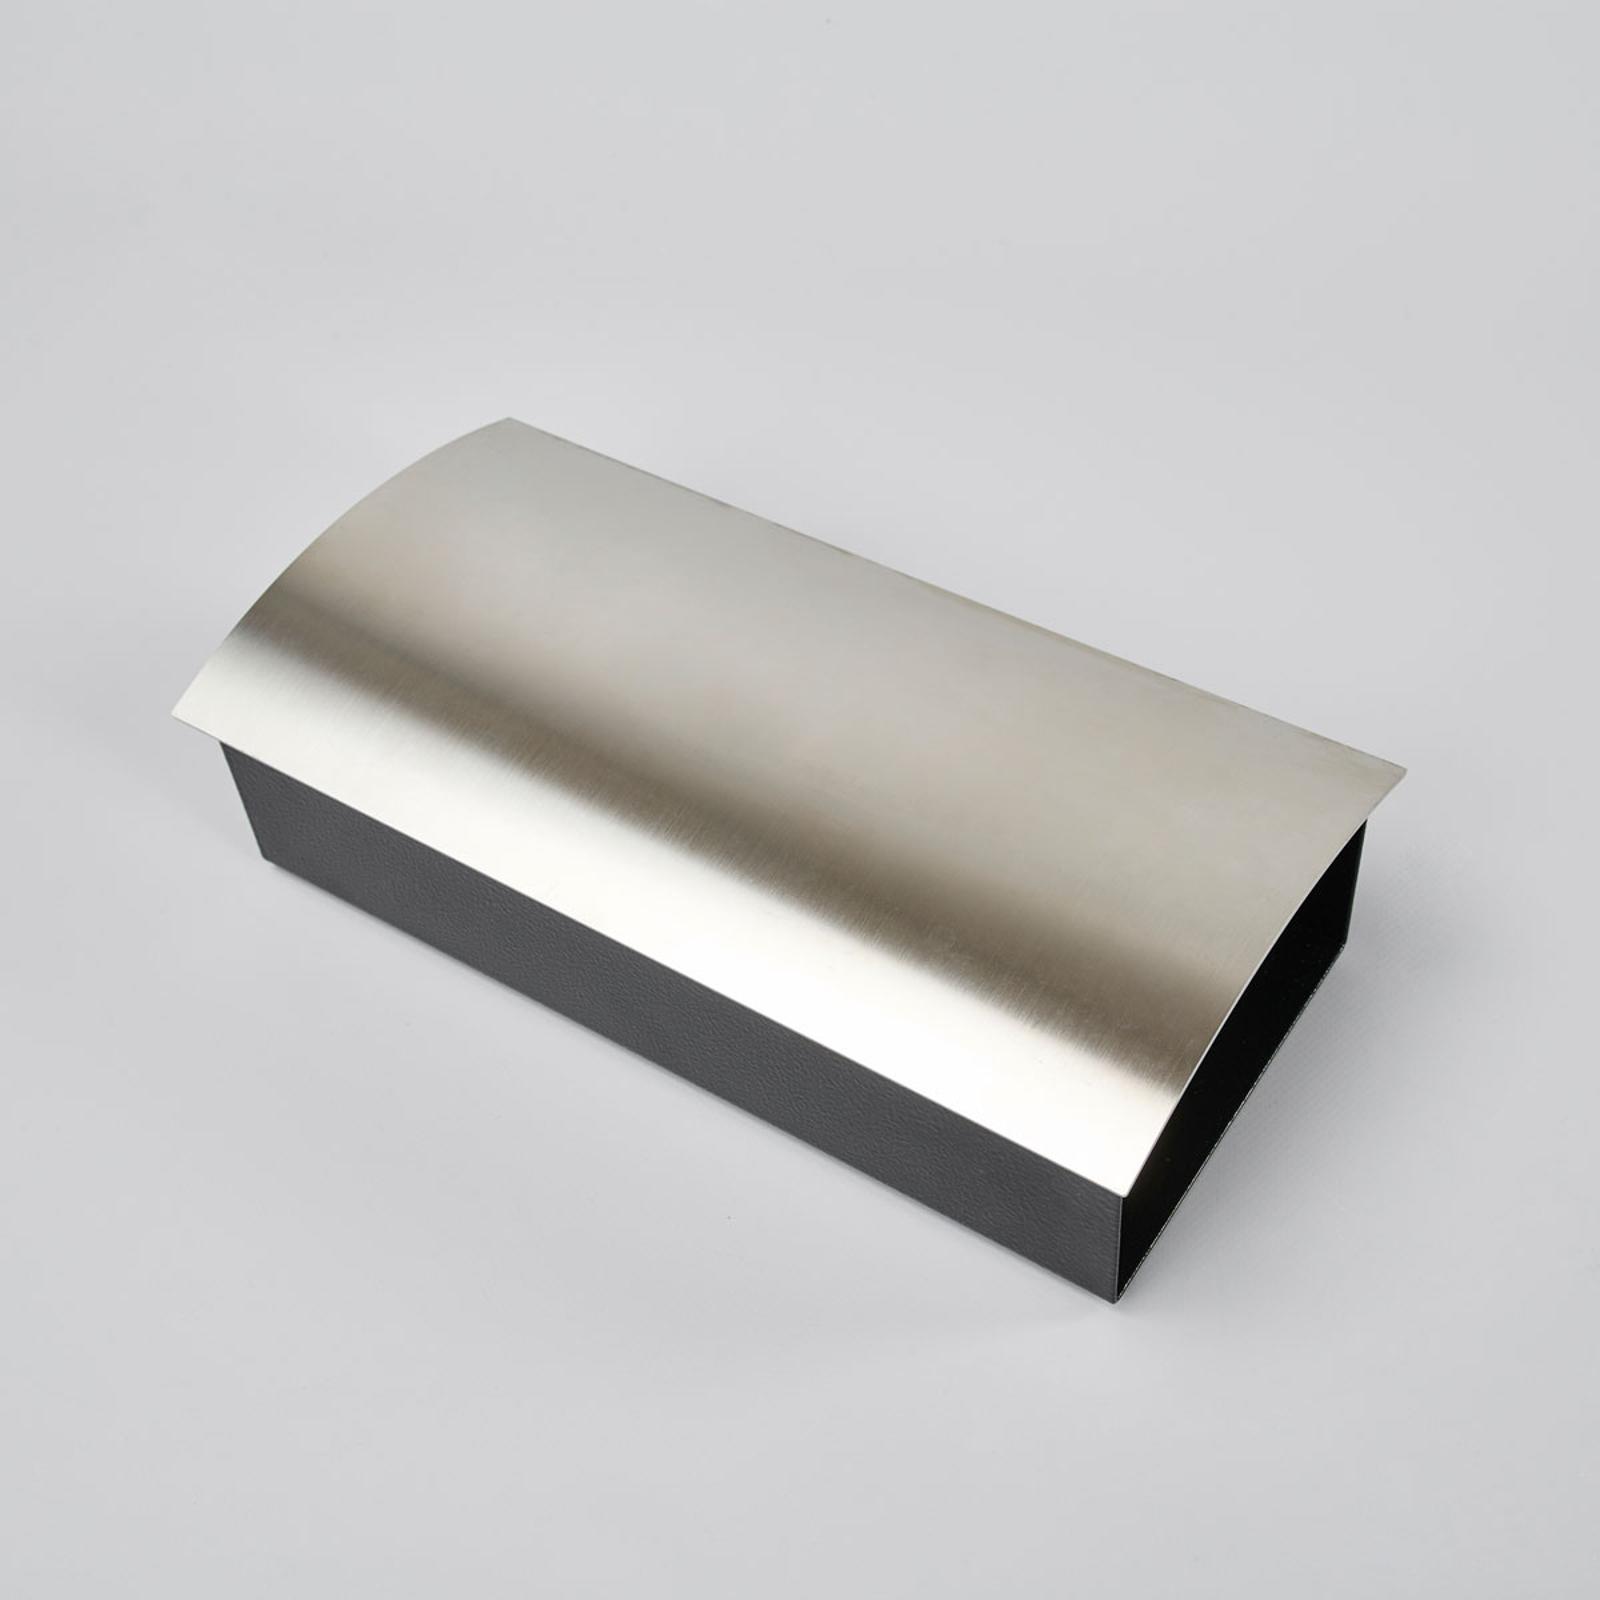 Eksklusivt Alani avisrør i rustfrit stål